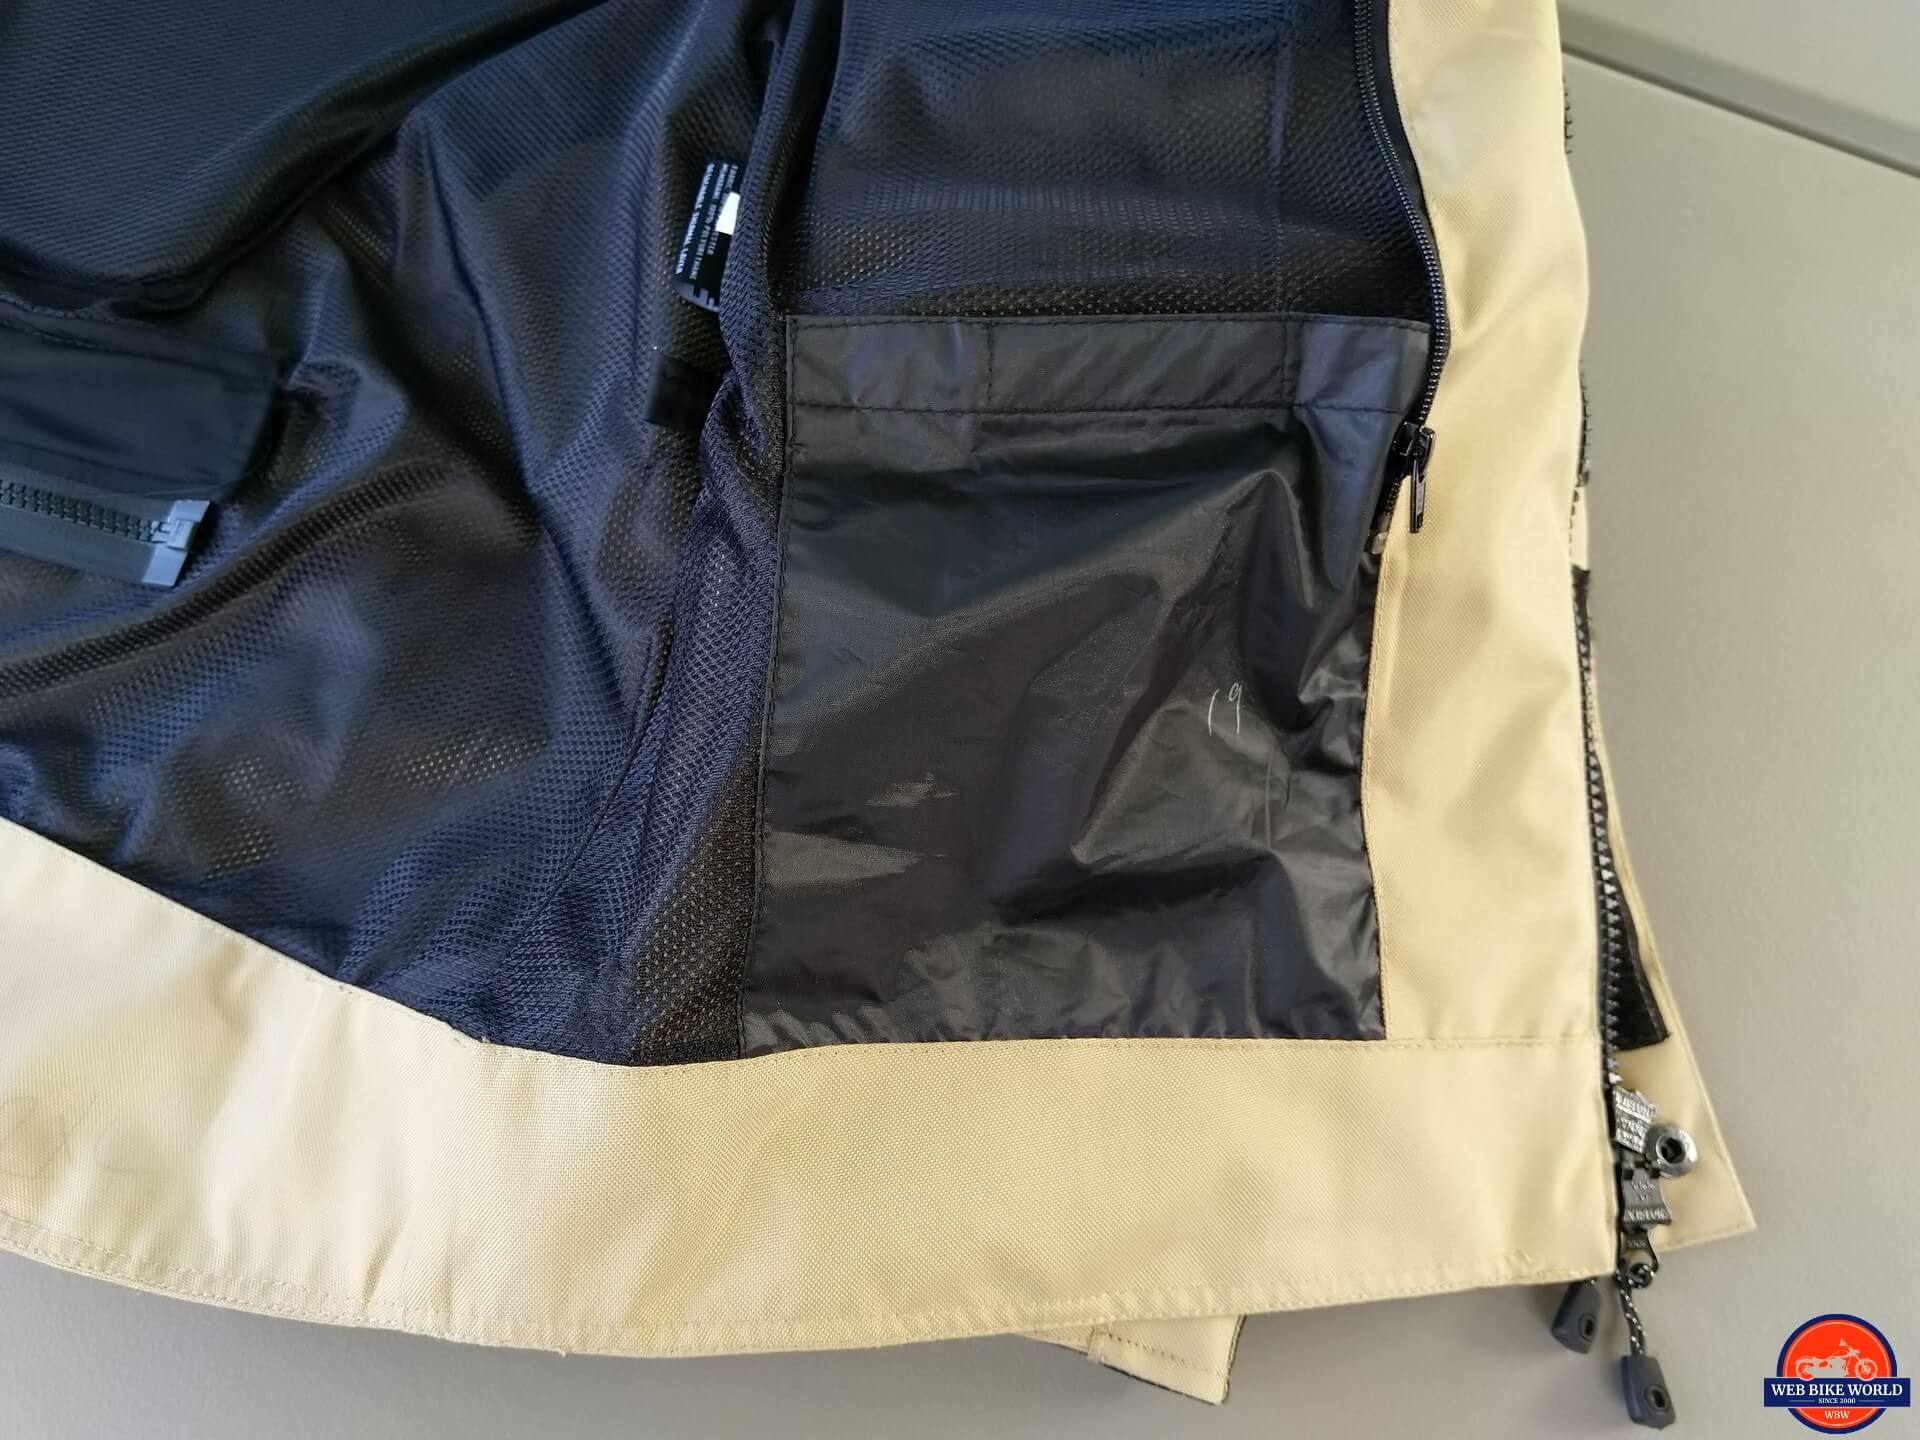 Motonation Pursang Textile Adventure Jacket interior wallet pocket closeup